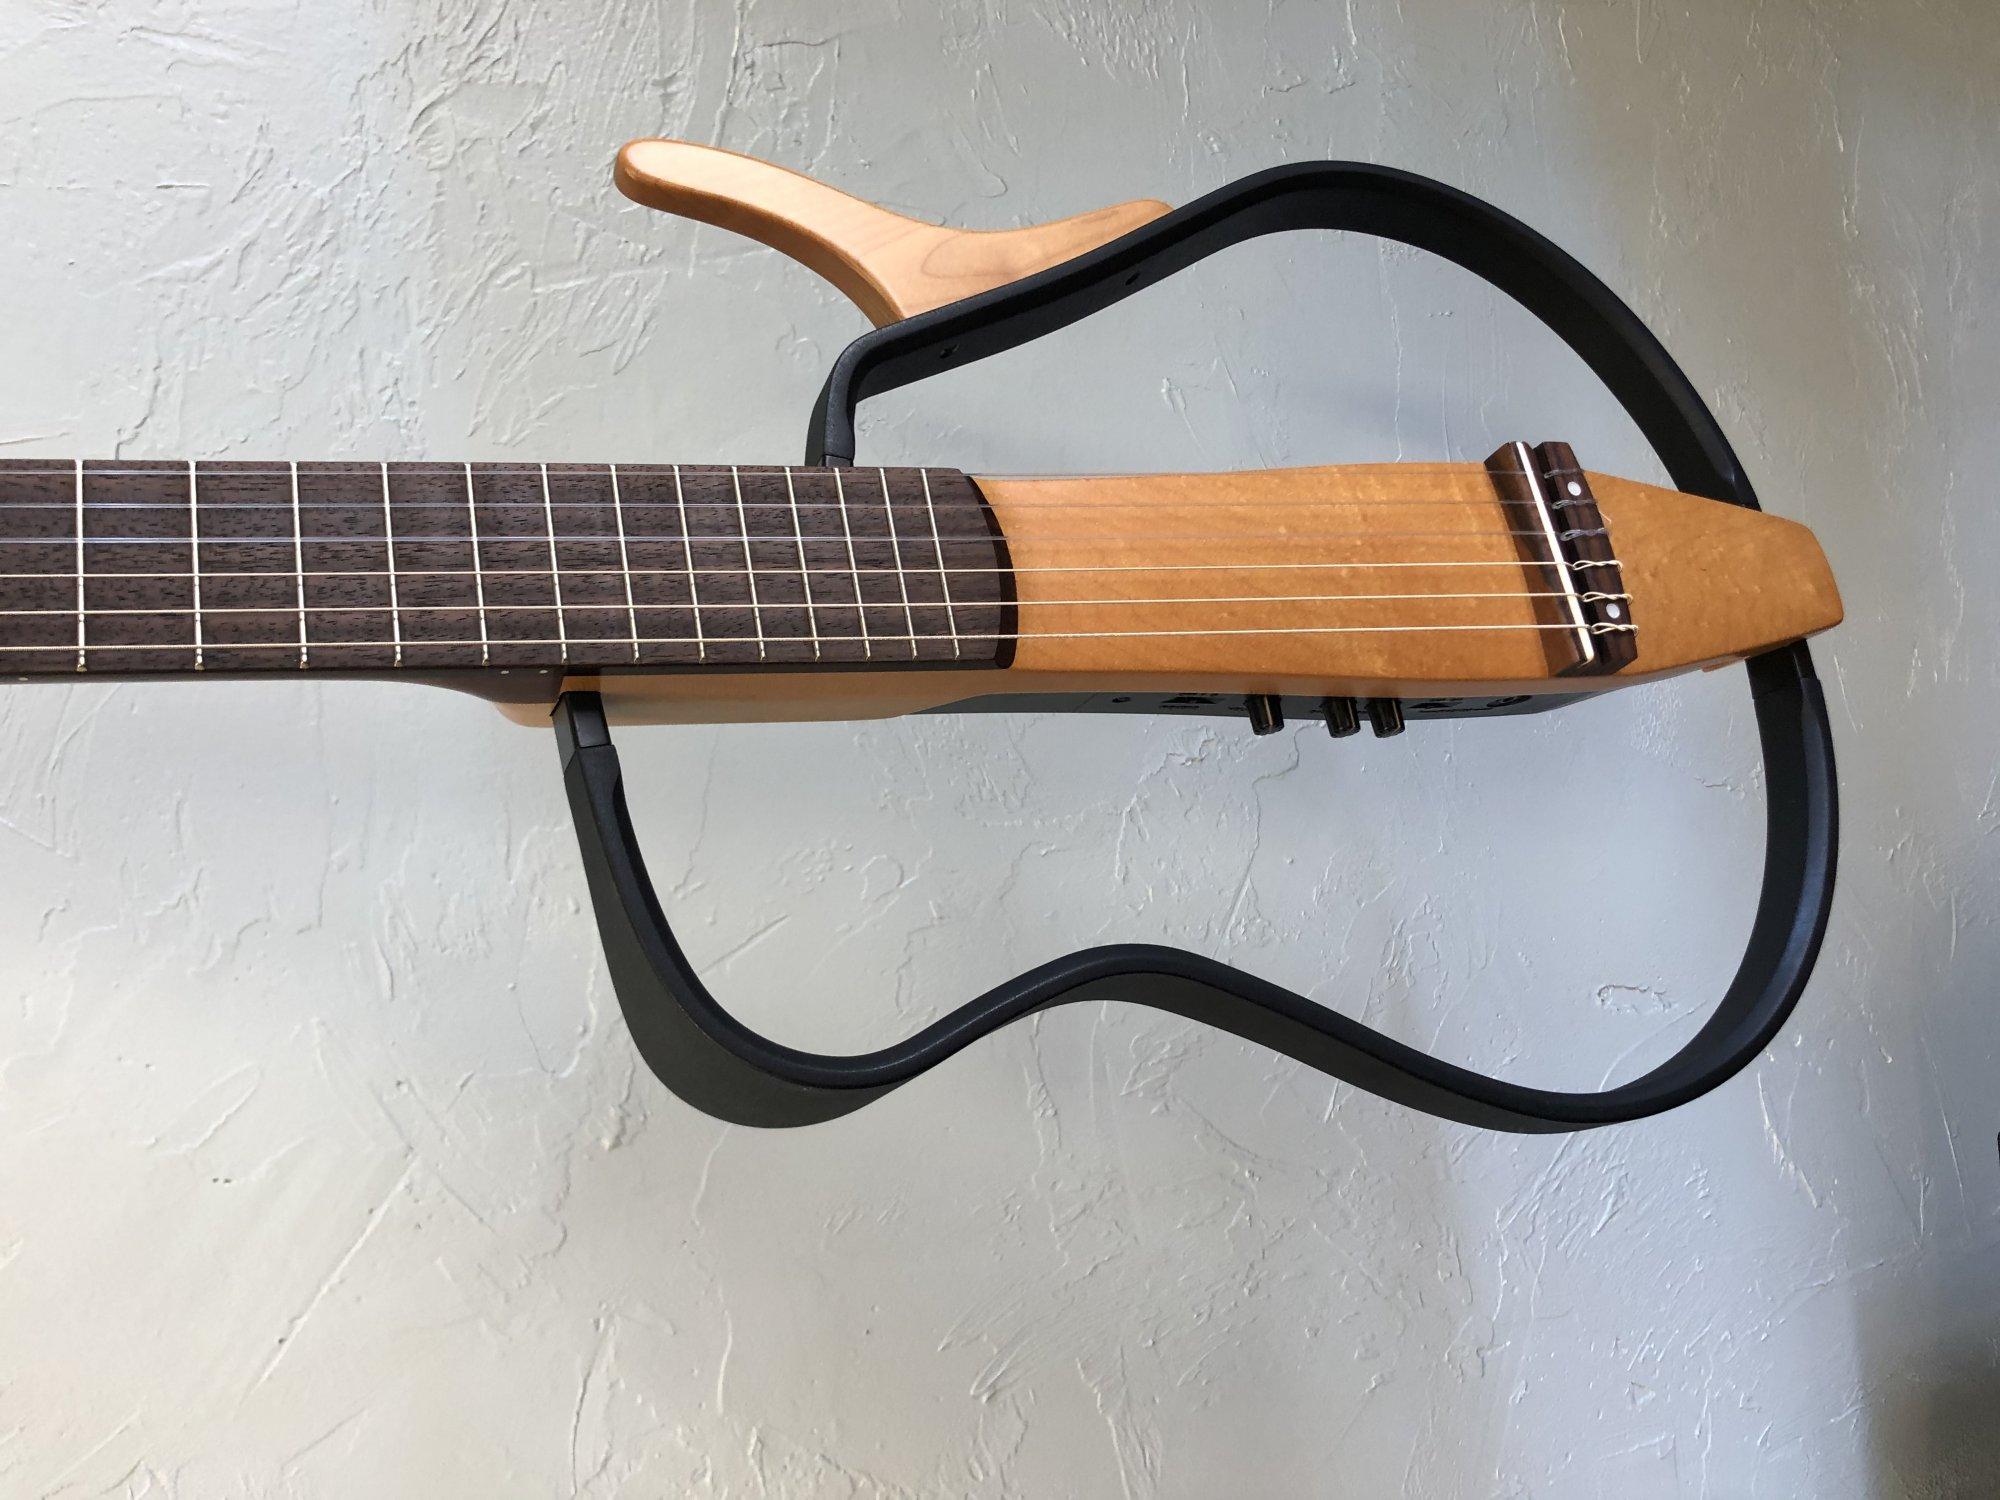 Used Yamaha SLG100N Classical Silent Guitar - Natural